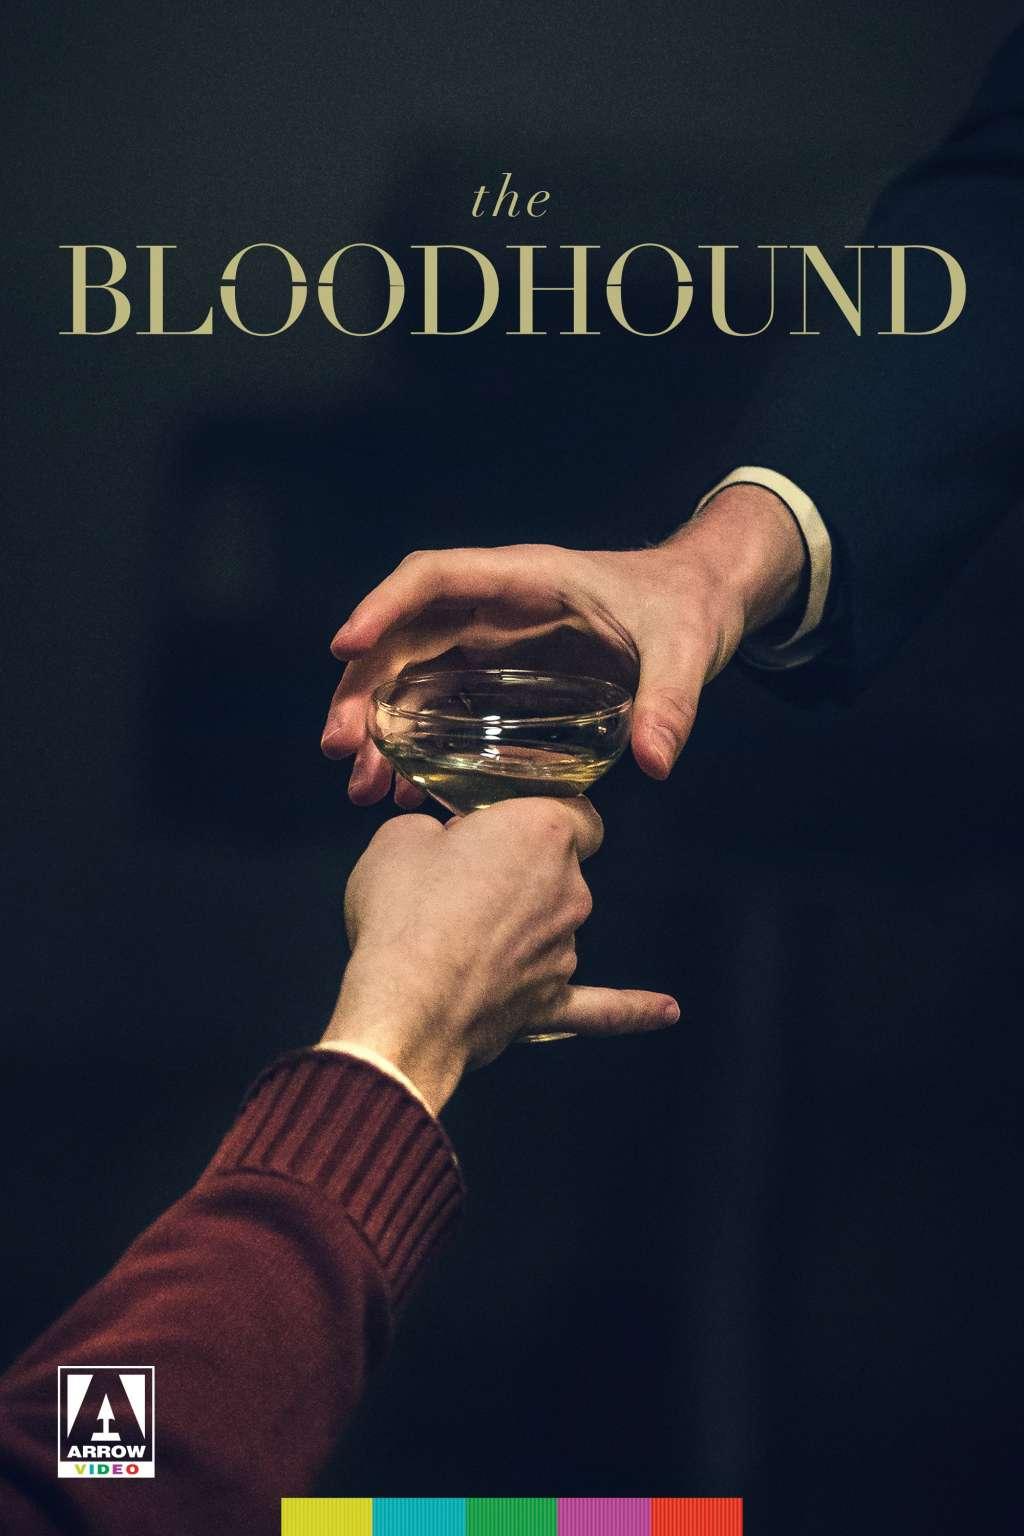 The Bloodhound kapak